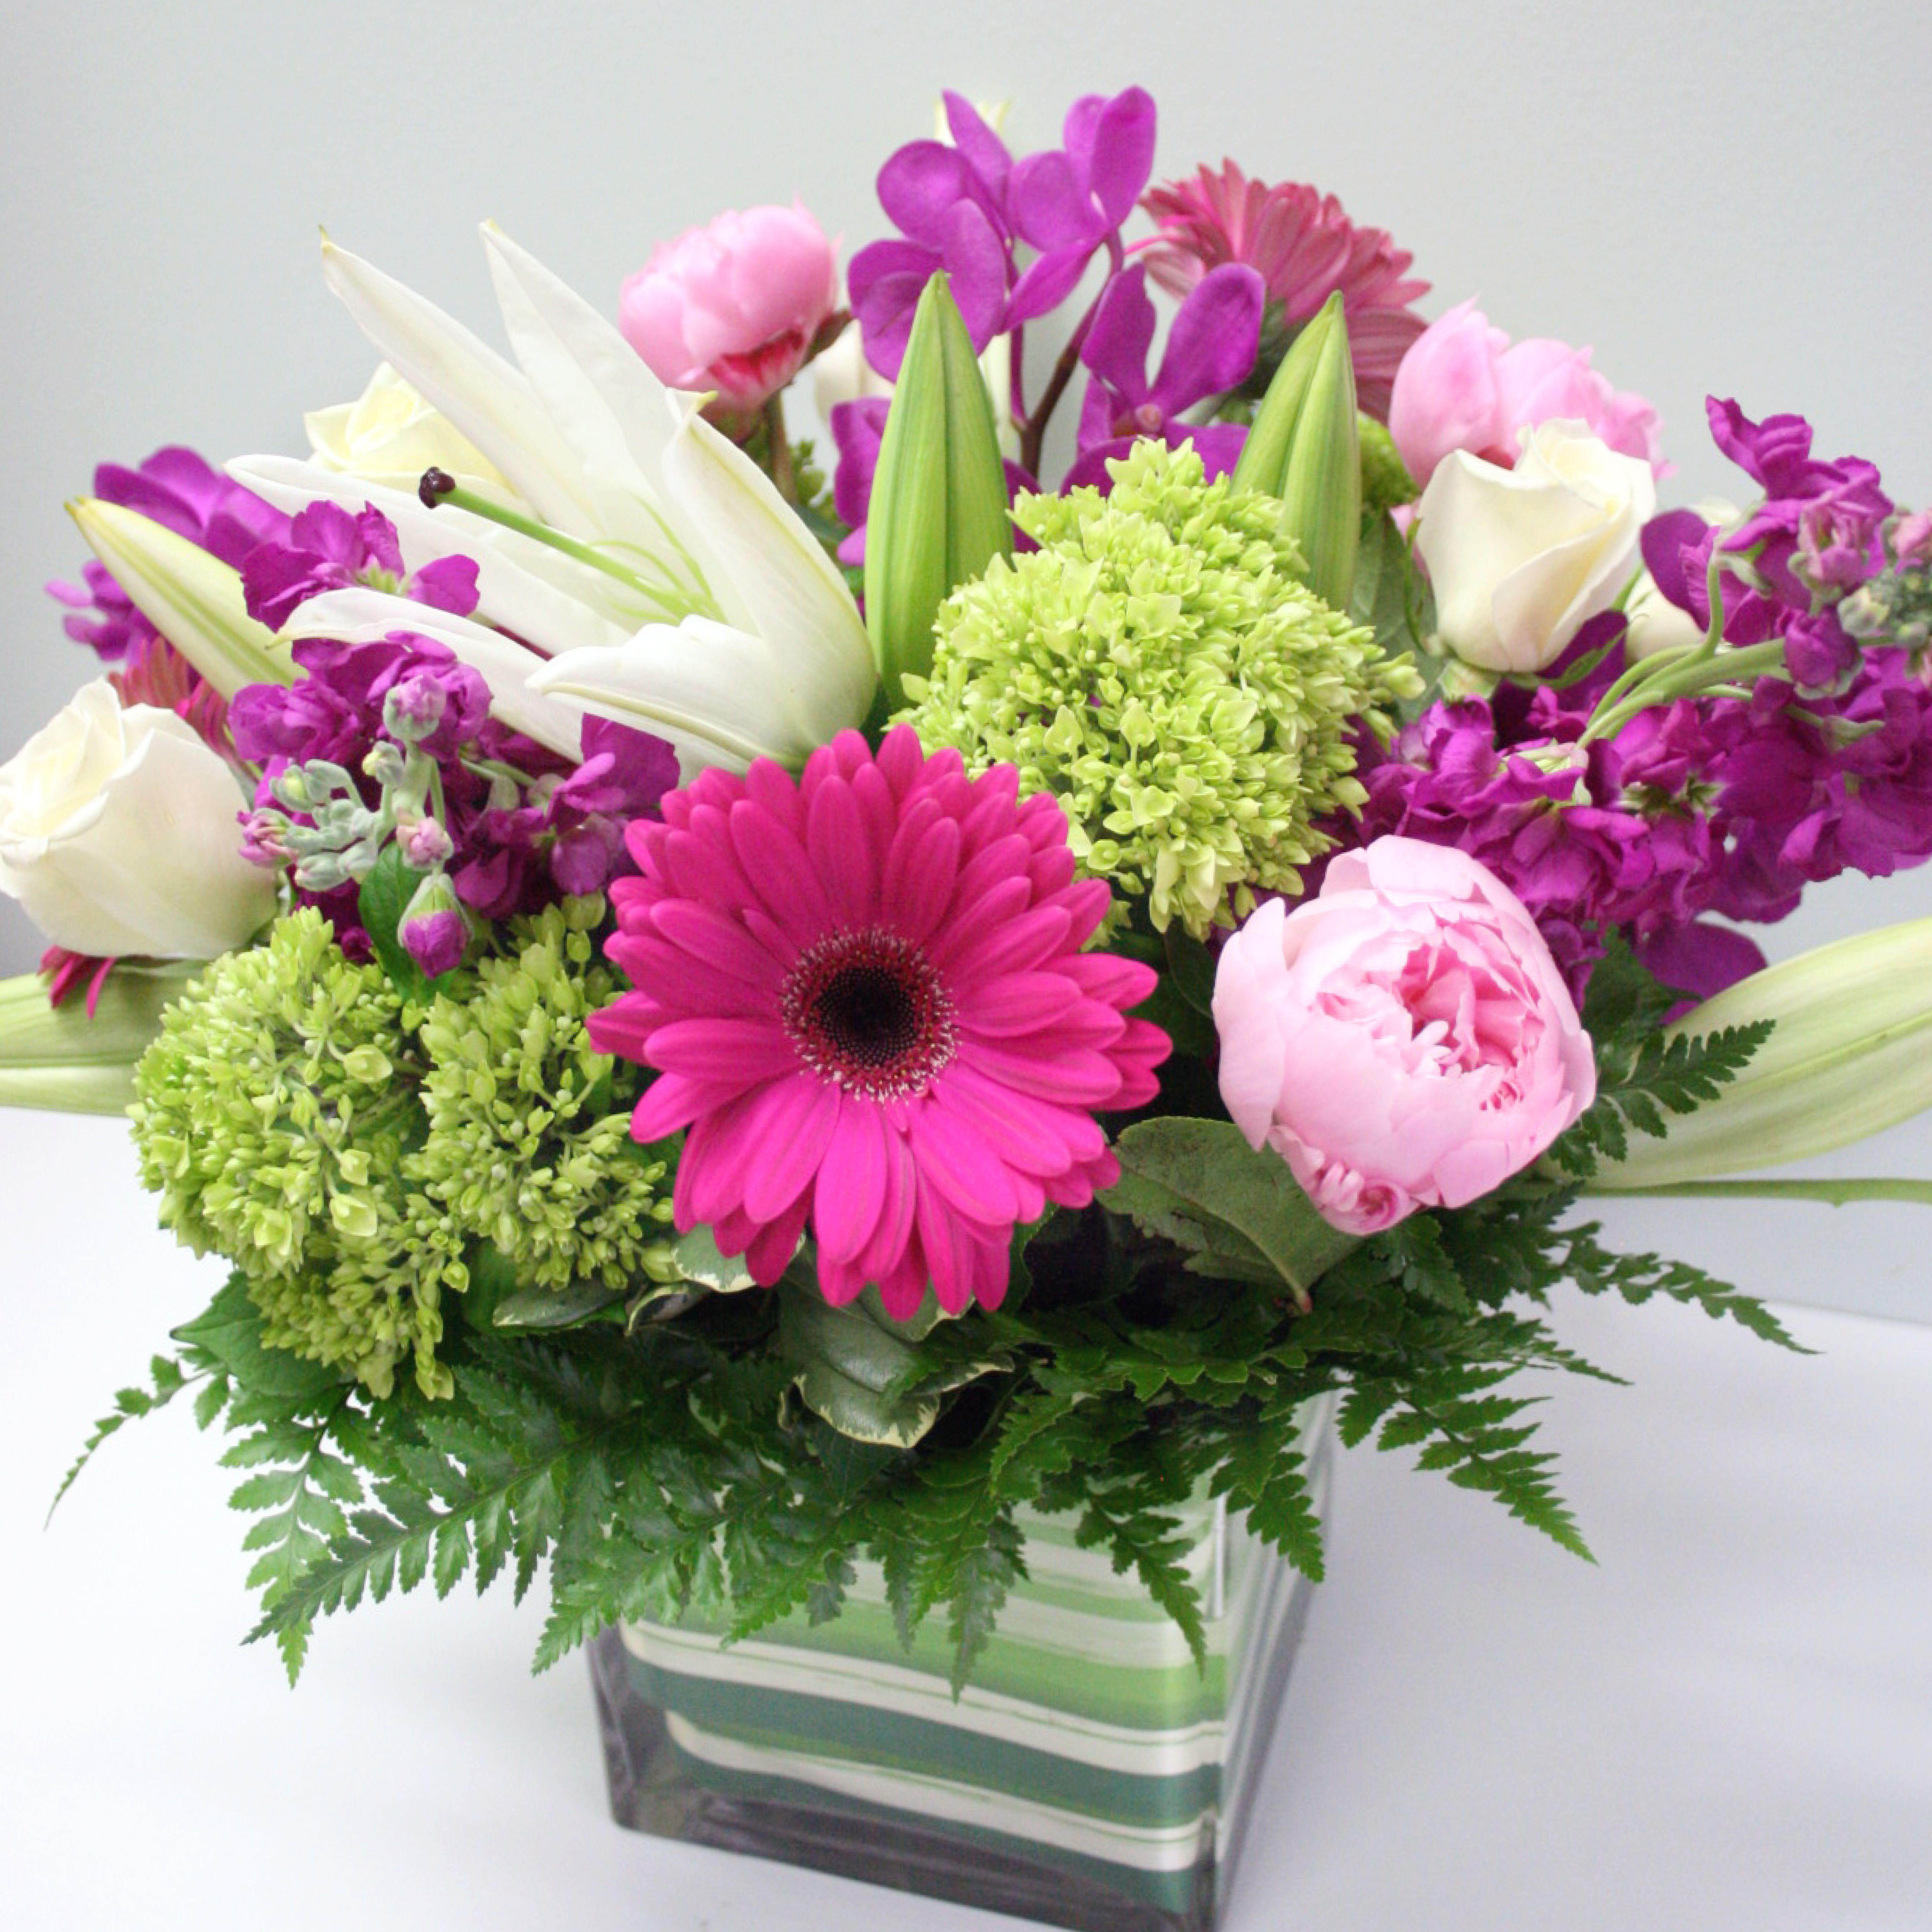 Women's Day Flower Arrangement Freytag's Florist